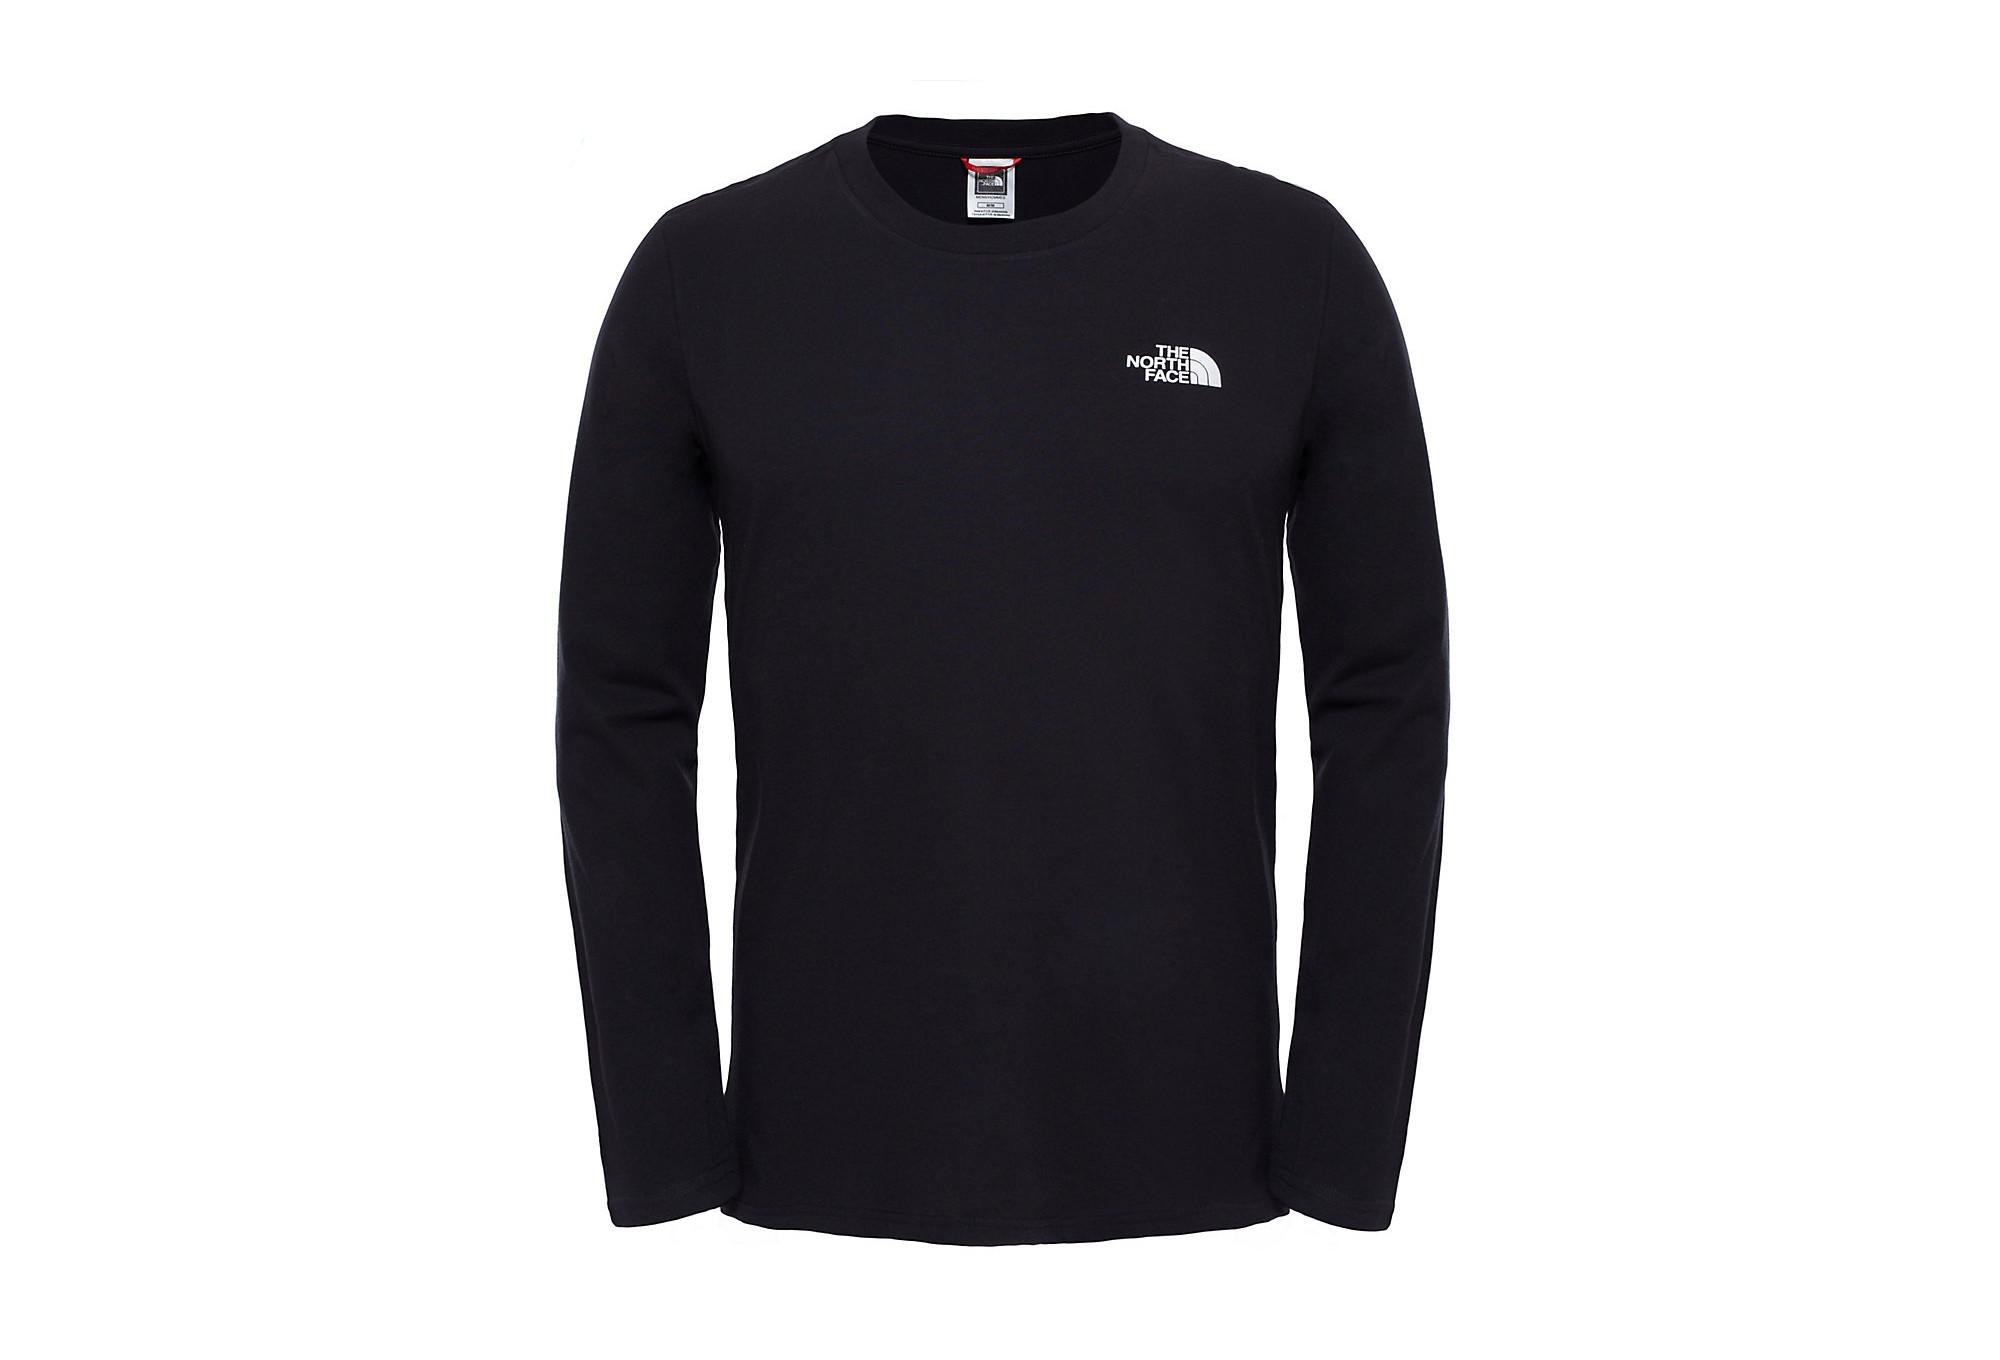 61a9cd888264d T-Shirt Long Sleeves THE NORTH FACE Easy Black   Alltricks.com